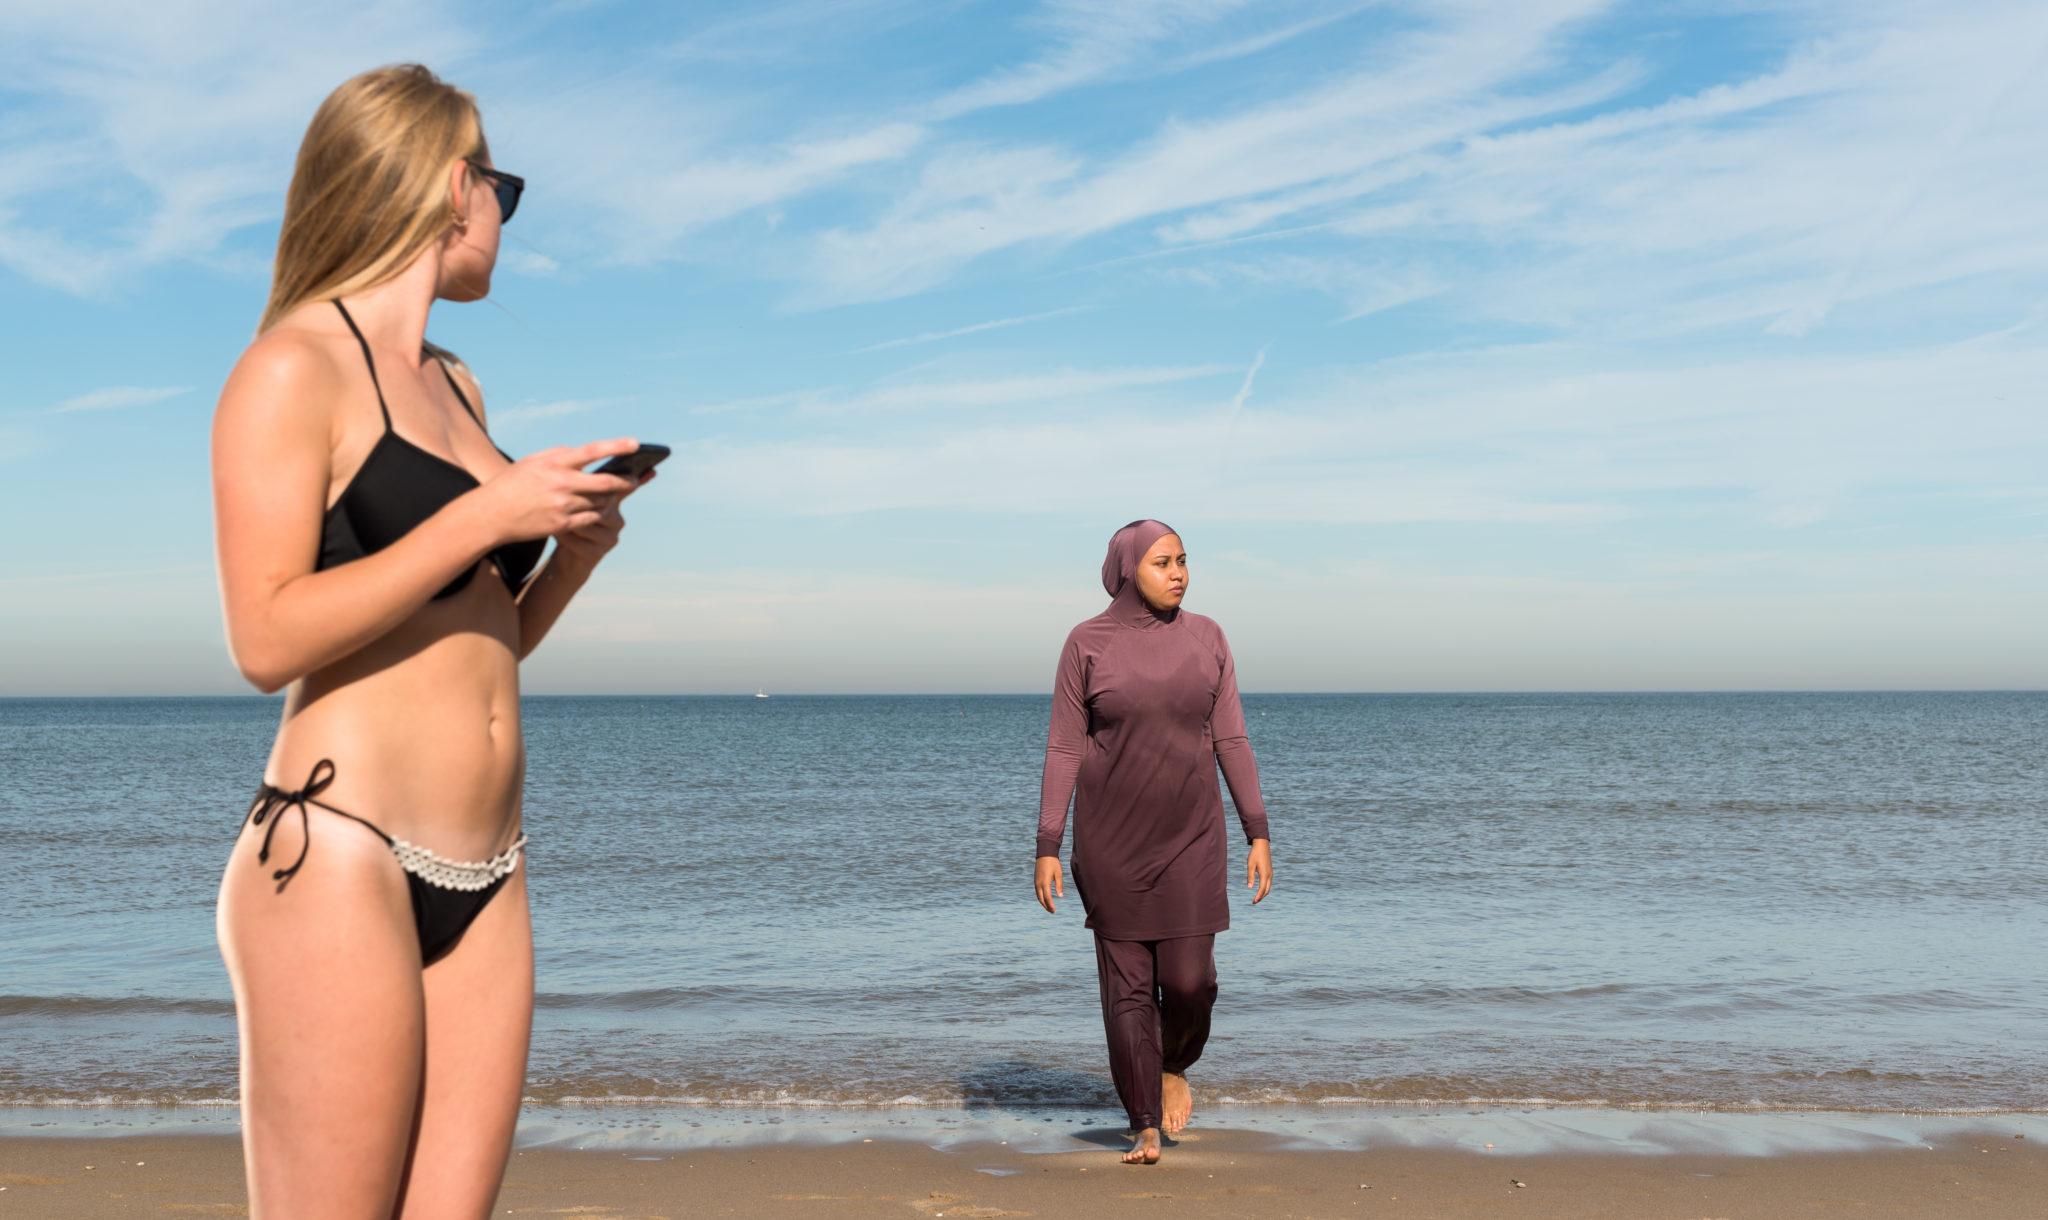 4f0e15ce4861f6 Algerijnse vrouwen willen bikini kunnen dragen op het strand - Elsevier  Weekblad